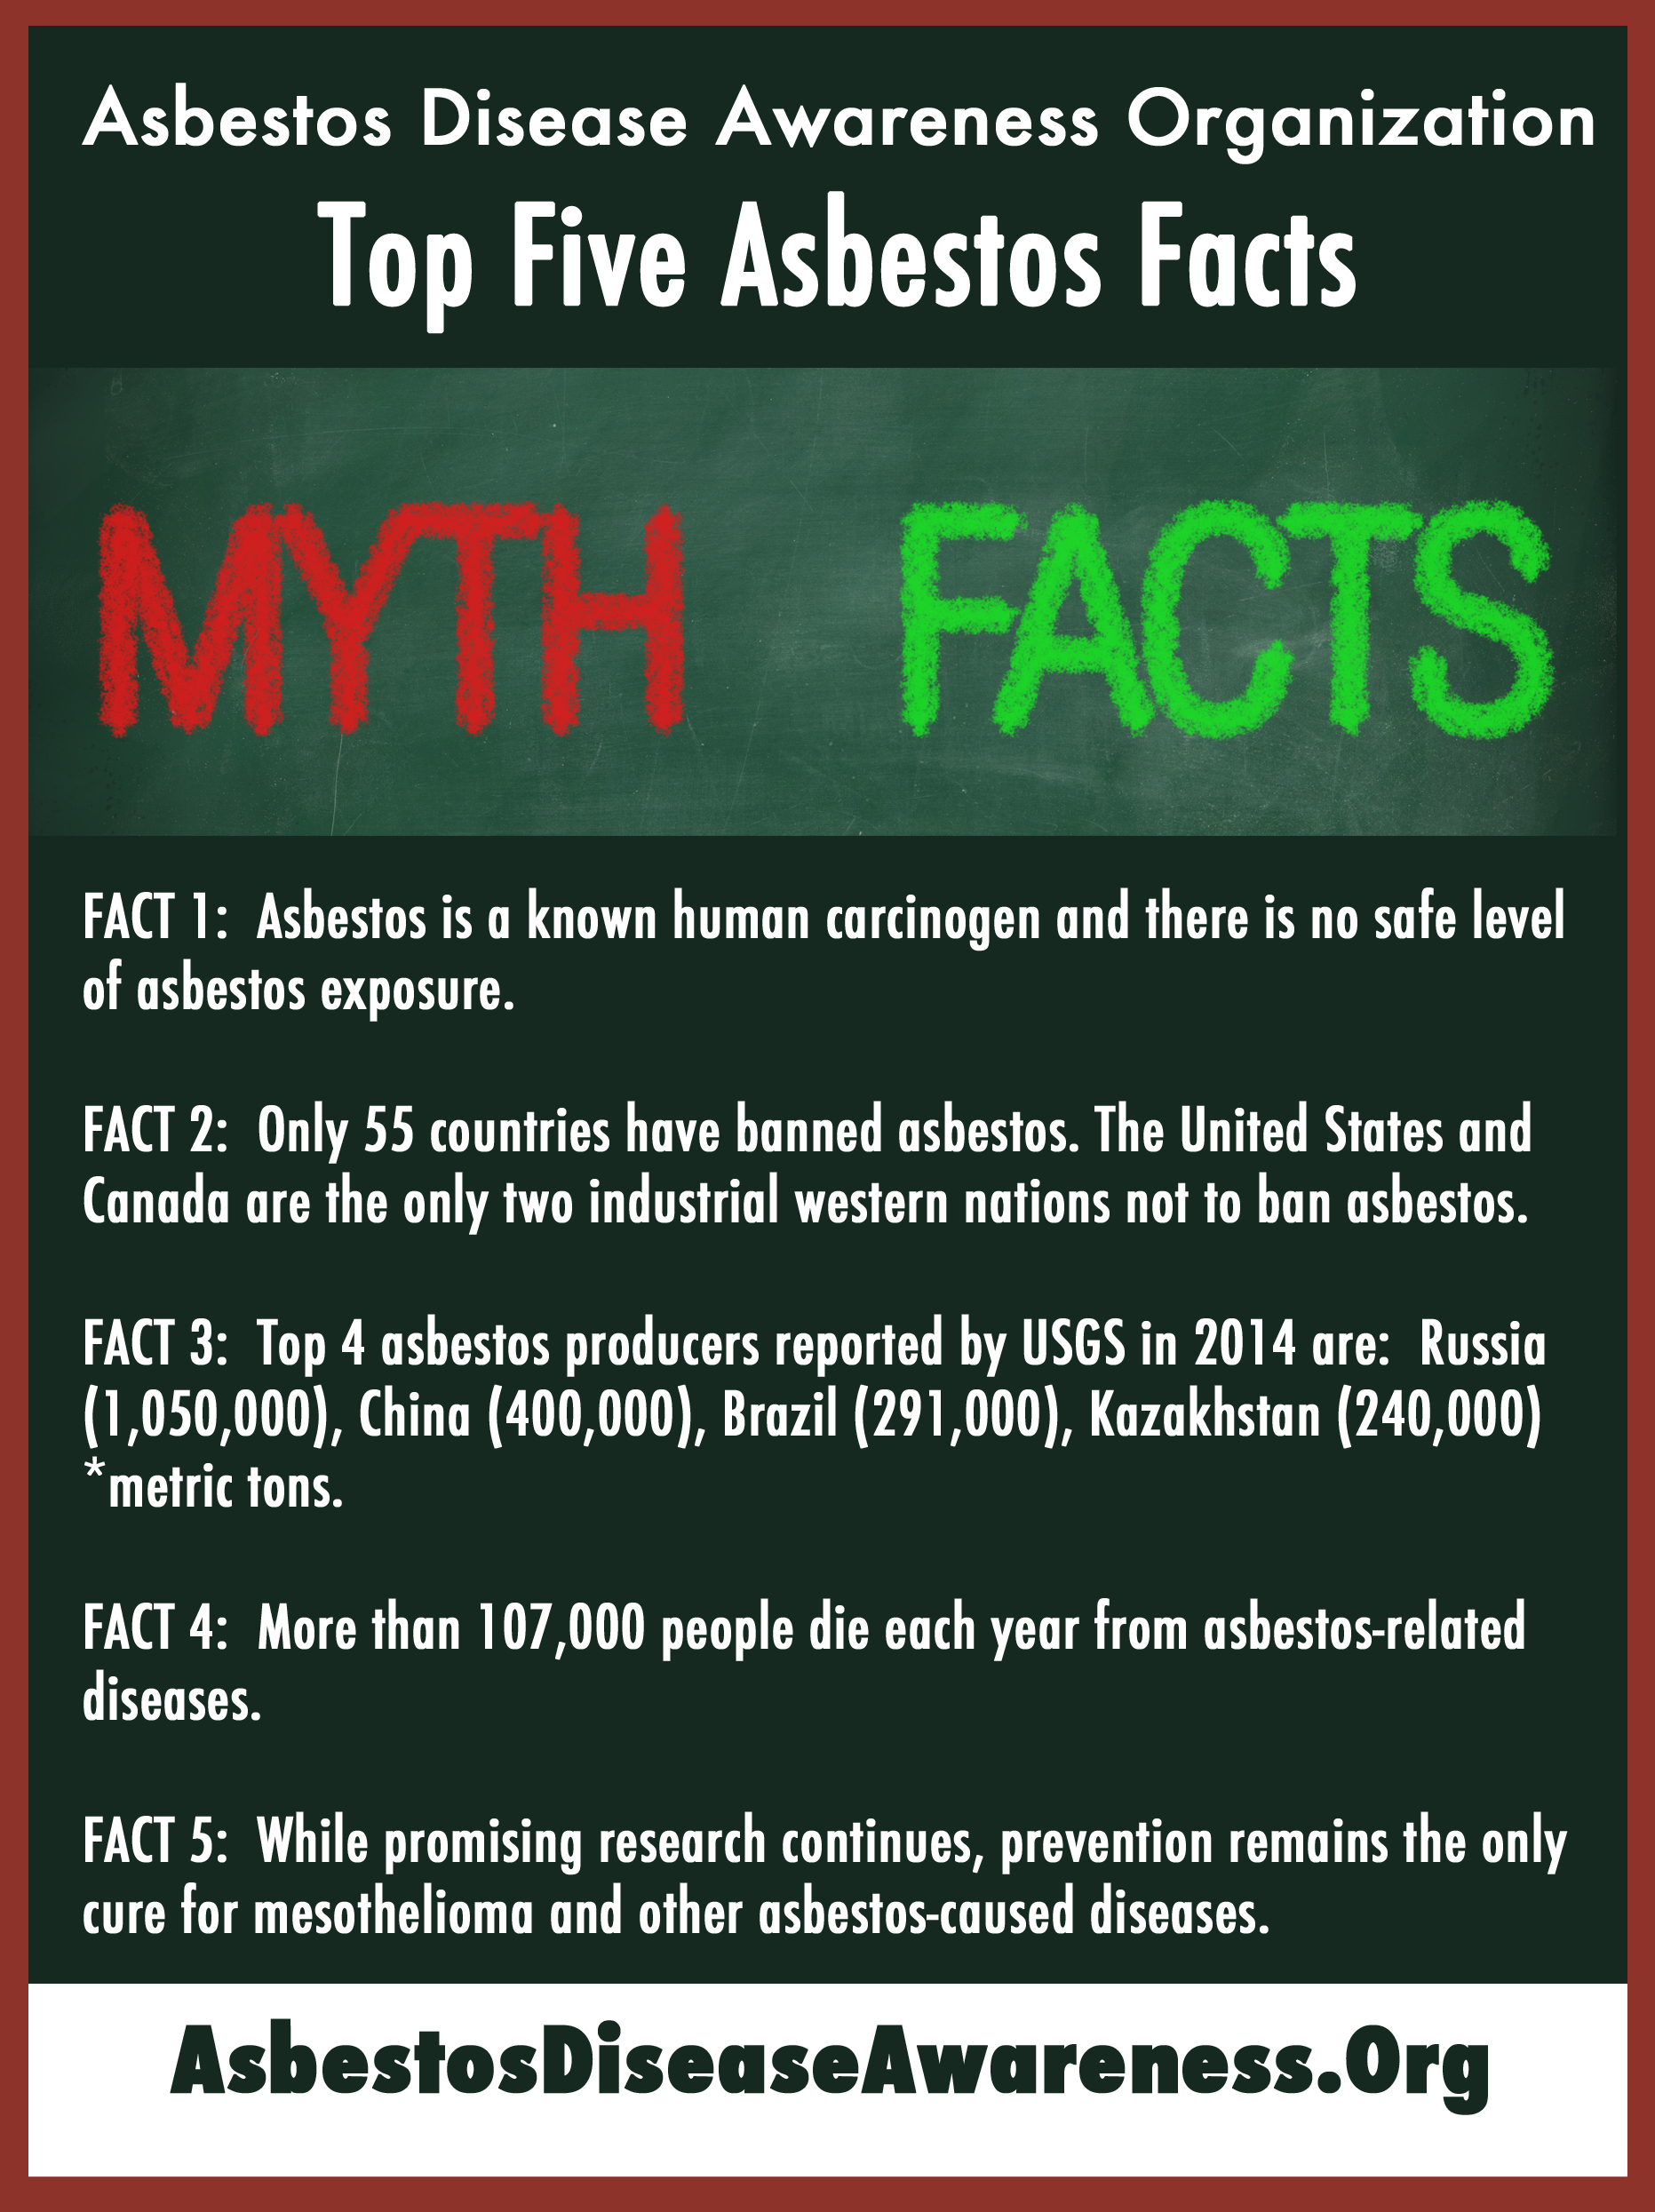 Asbestos Disease Awareness Organization Top Five Asbestos